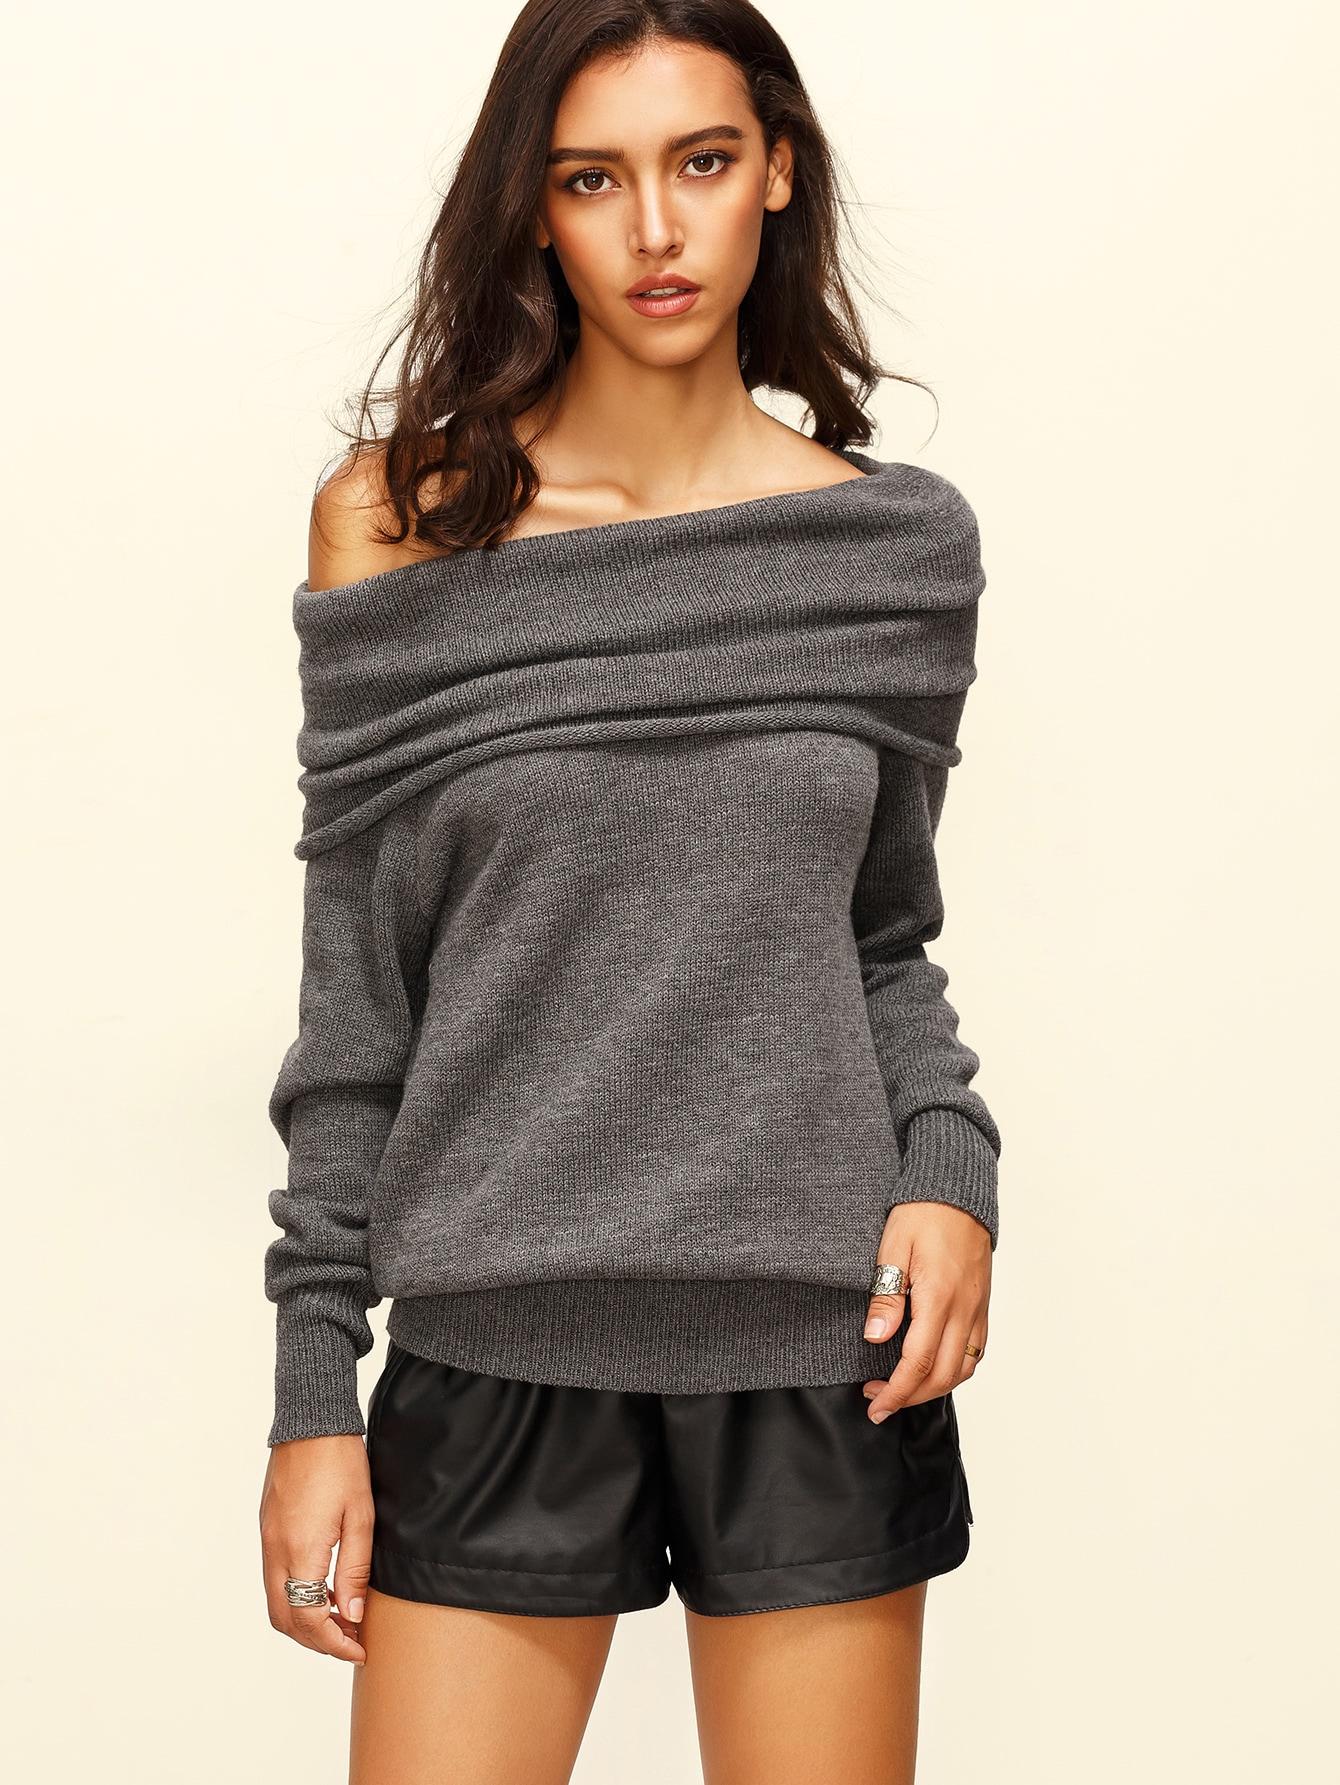 sweater160729704_2